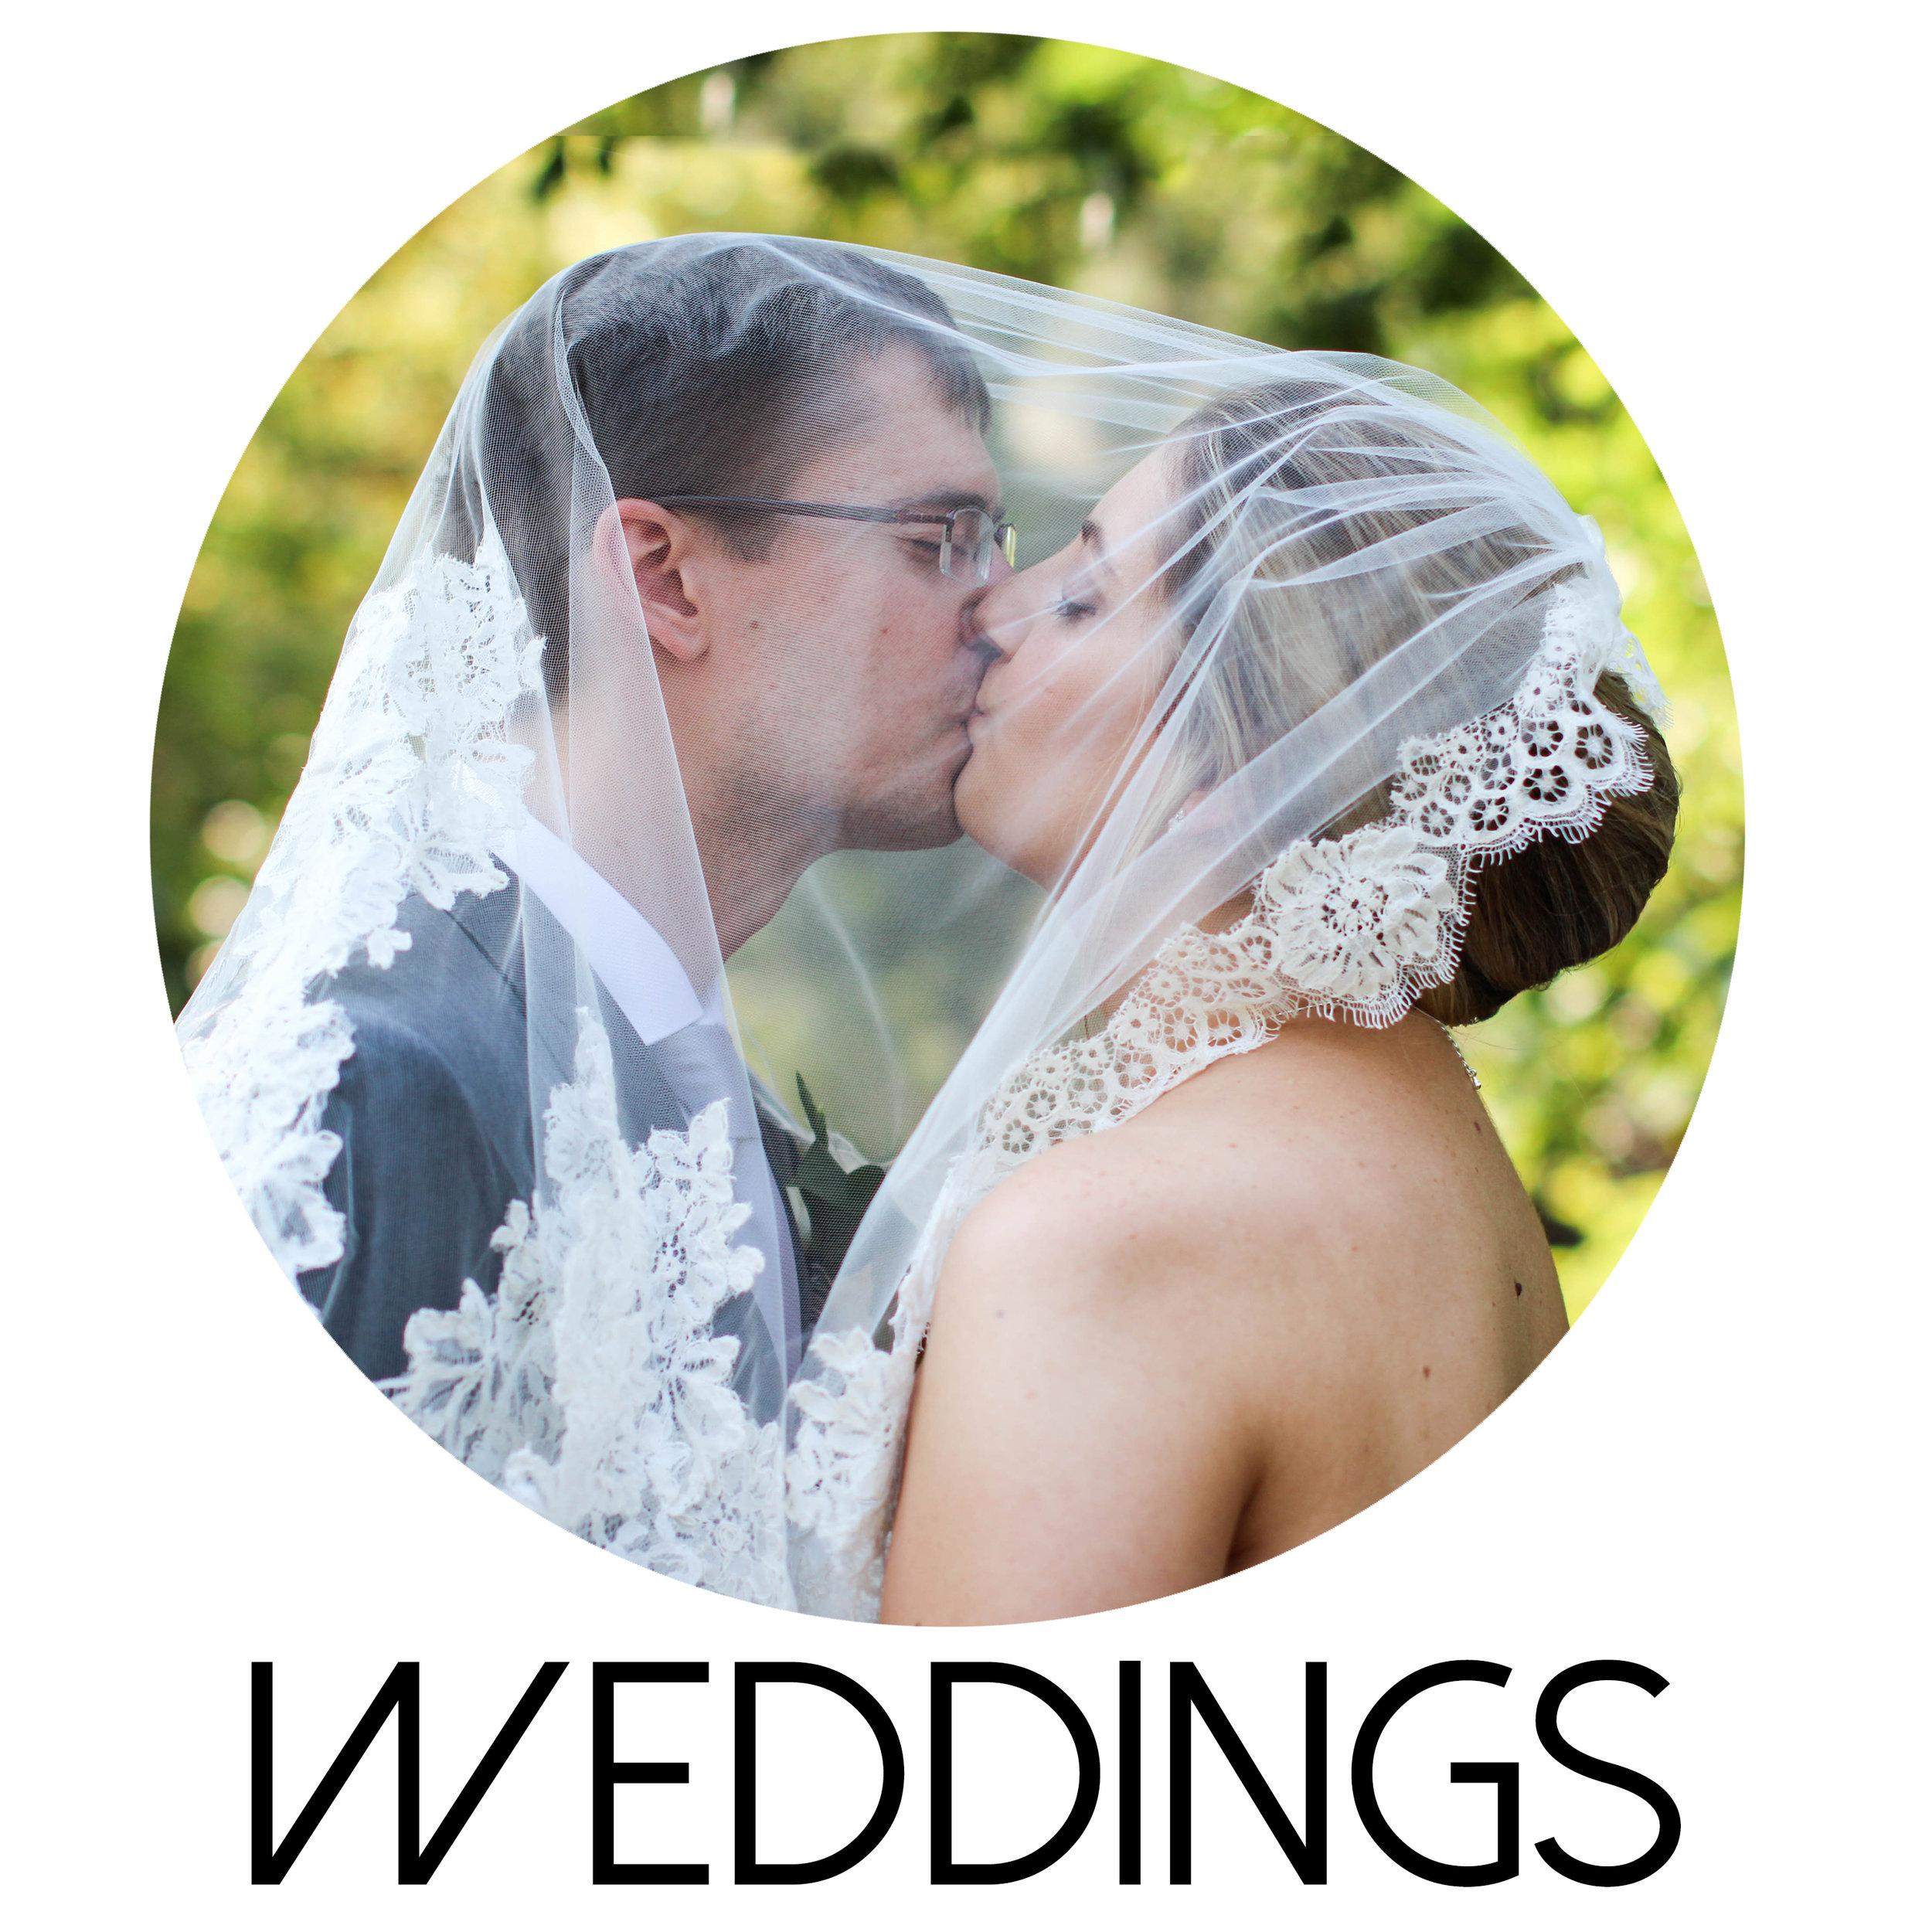 WeddingButton.jpg